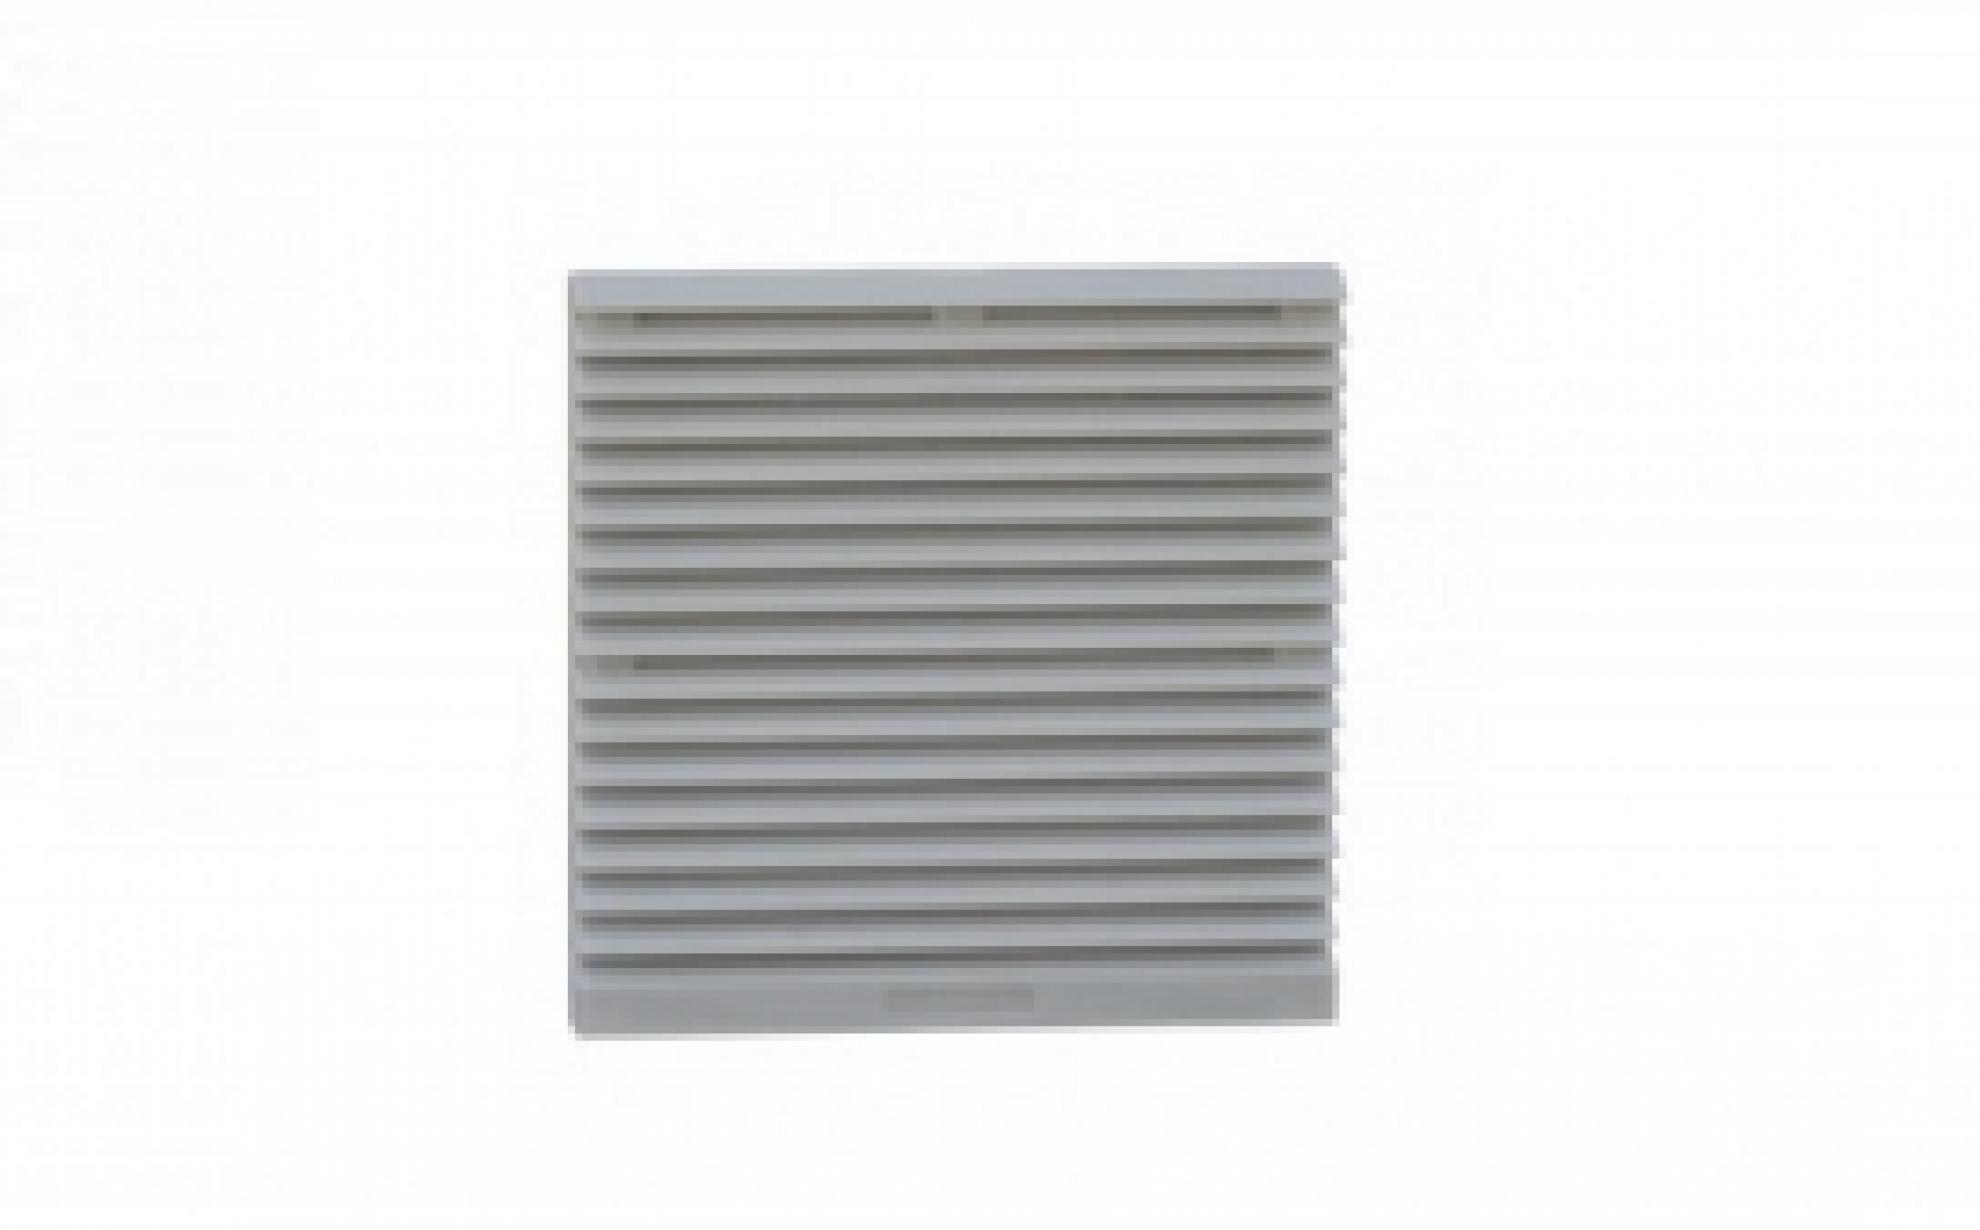 Veneziana Para Cooler 25,5 X 25,5 C/FILTRO